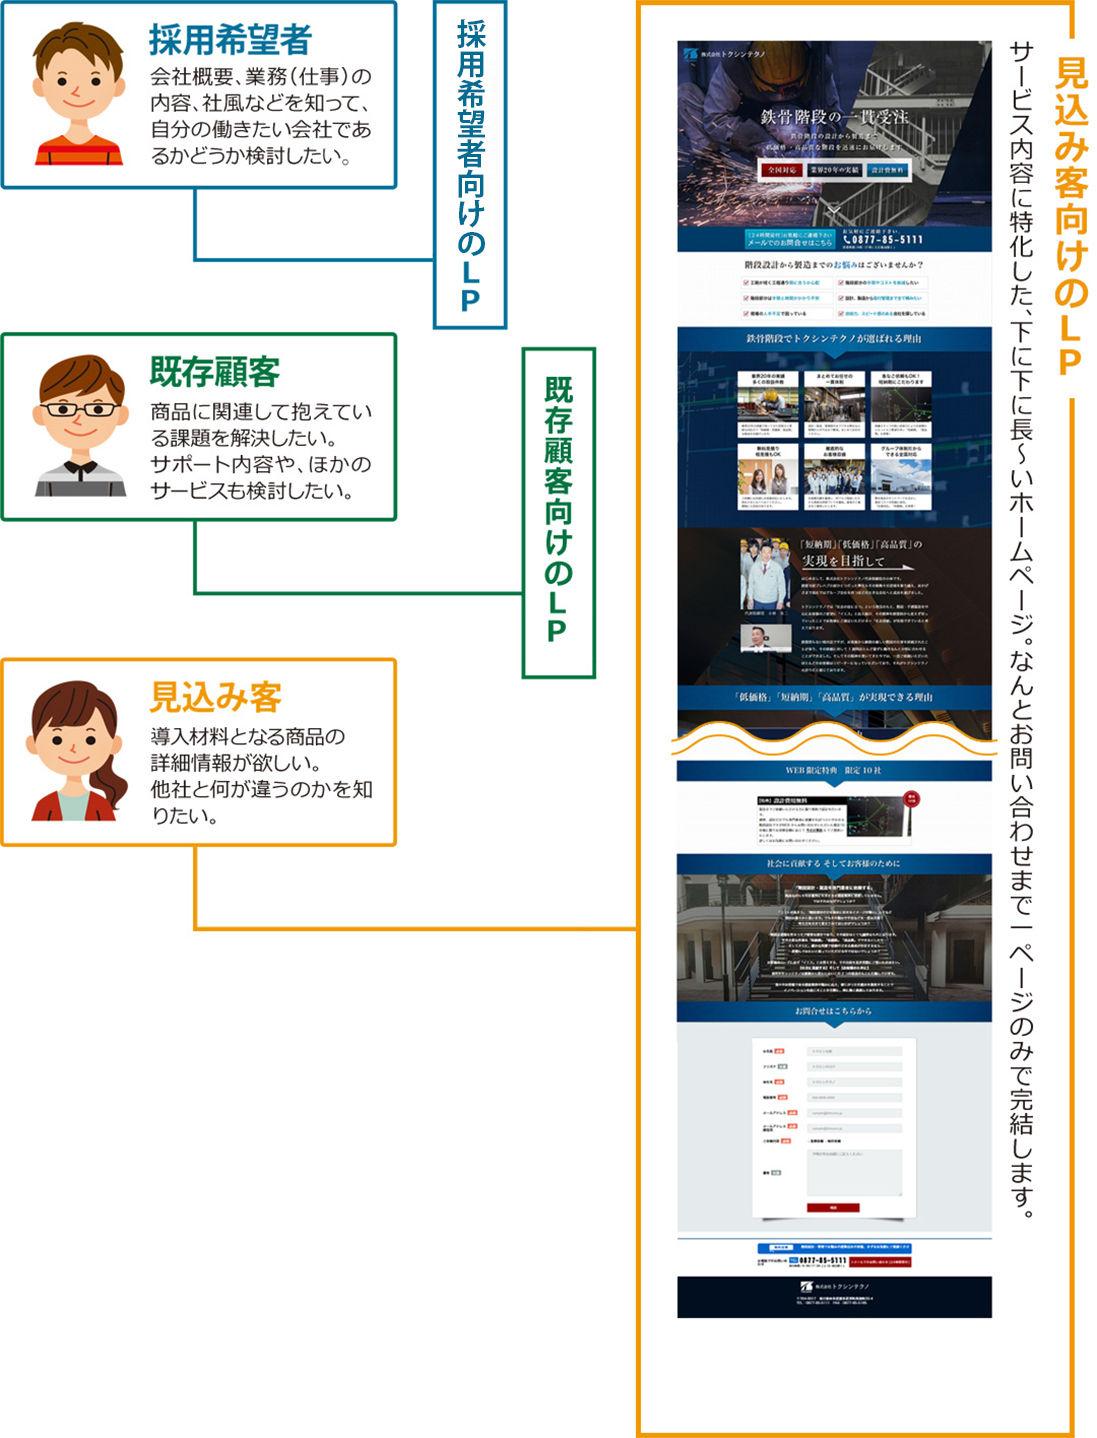 LPサイトの説明